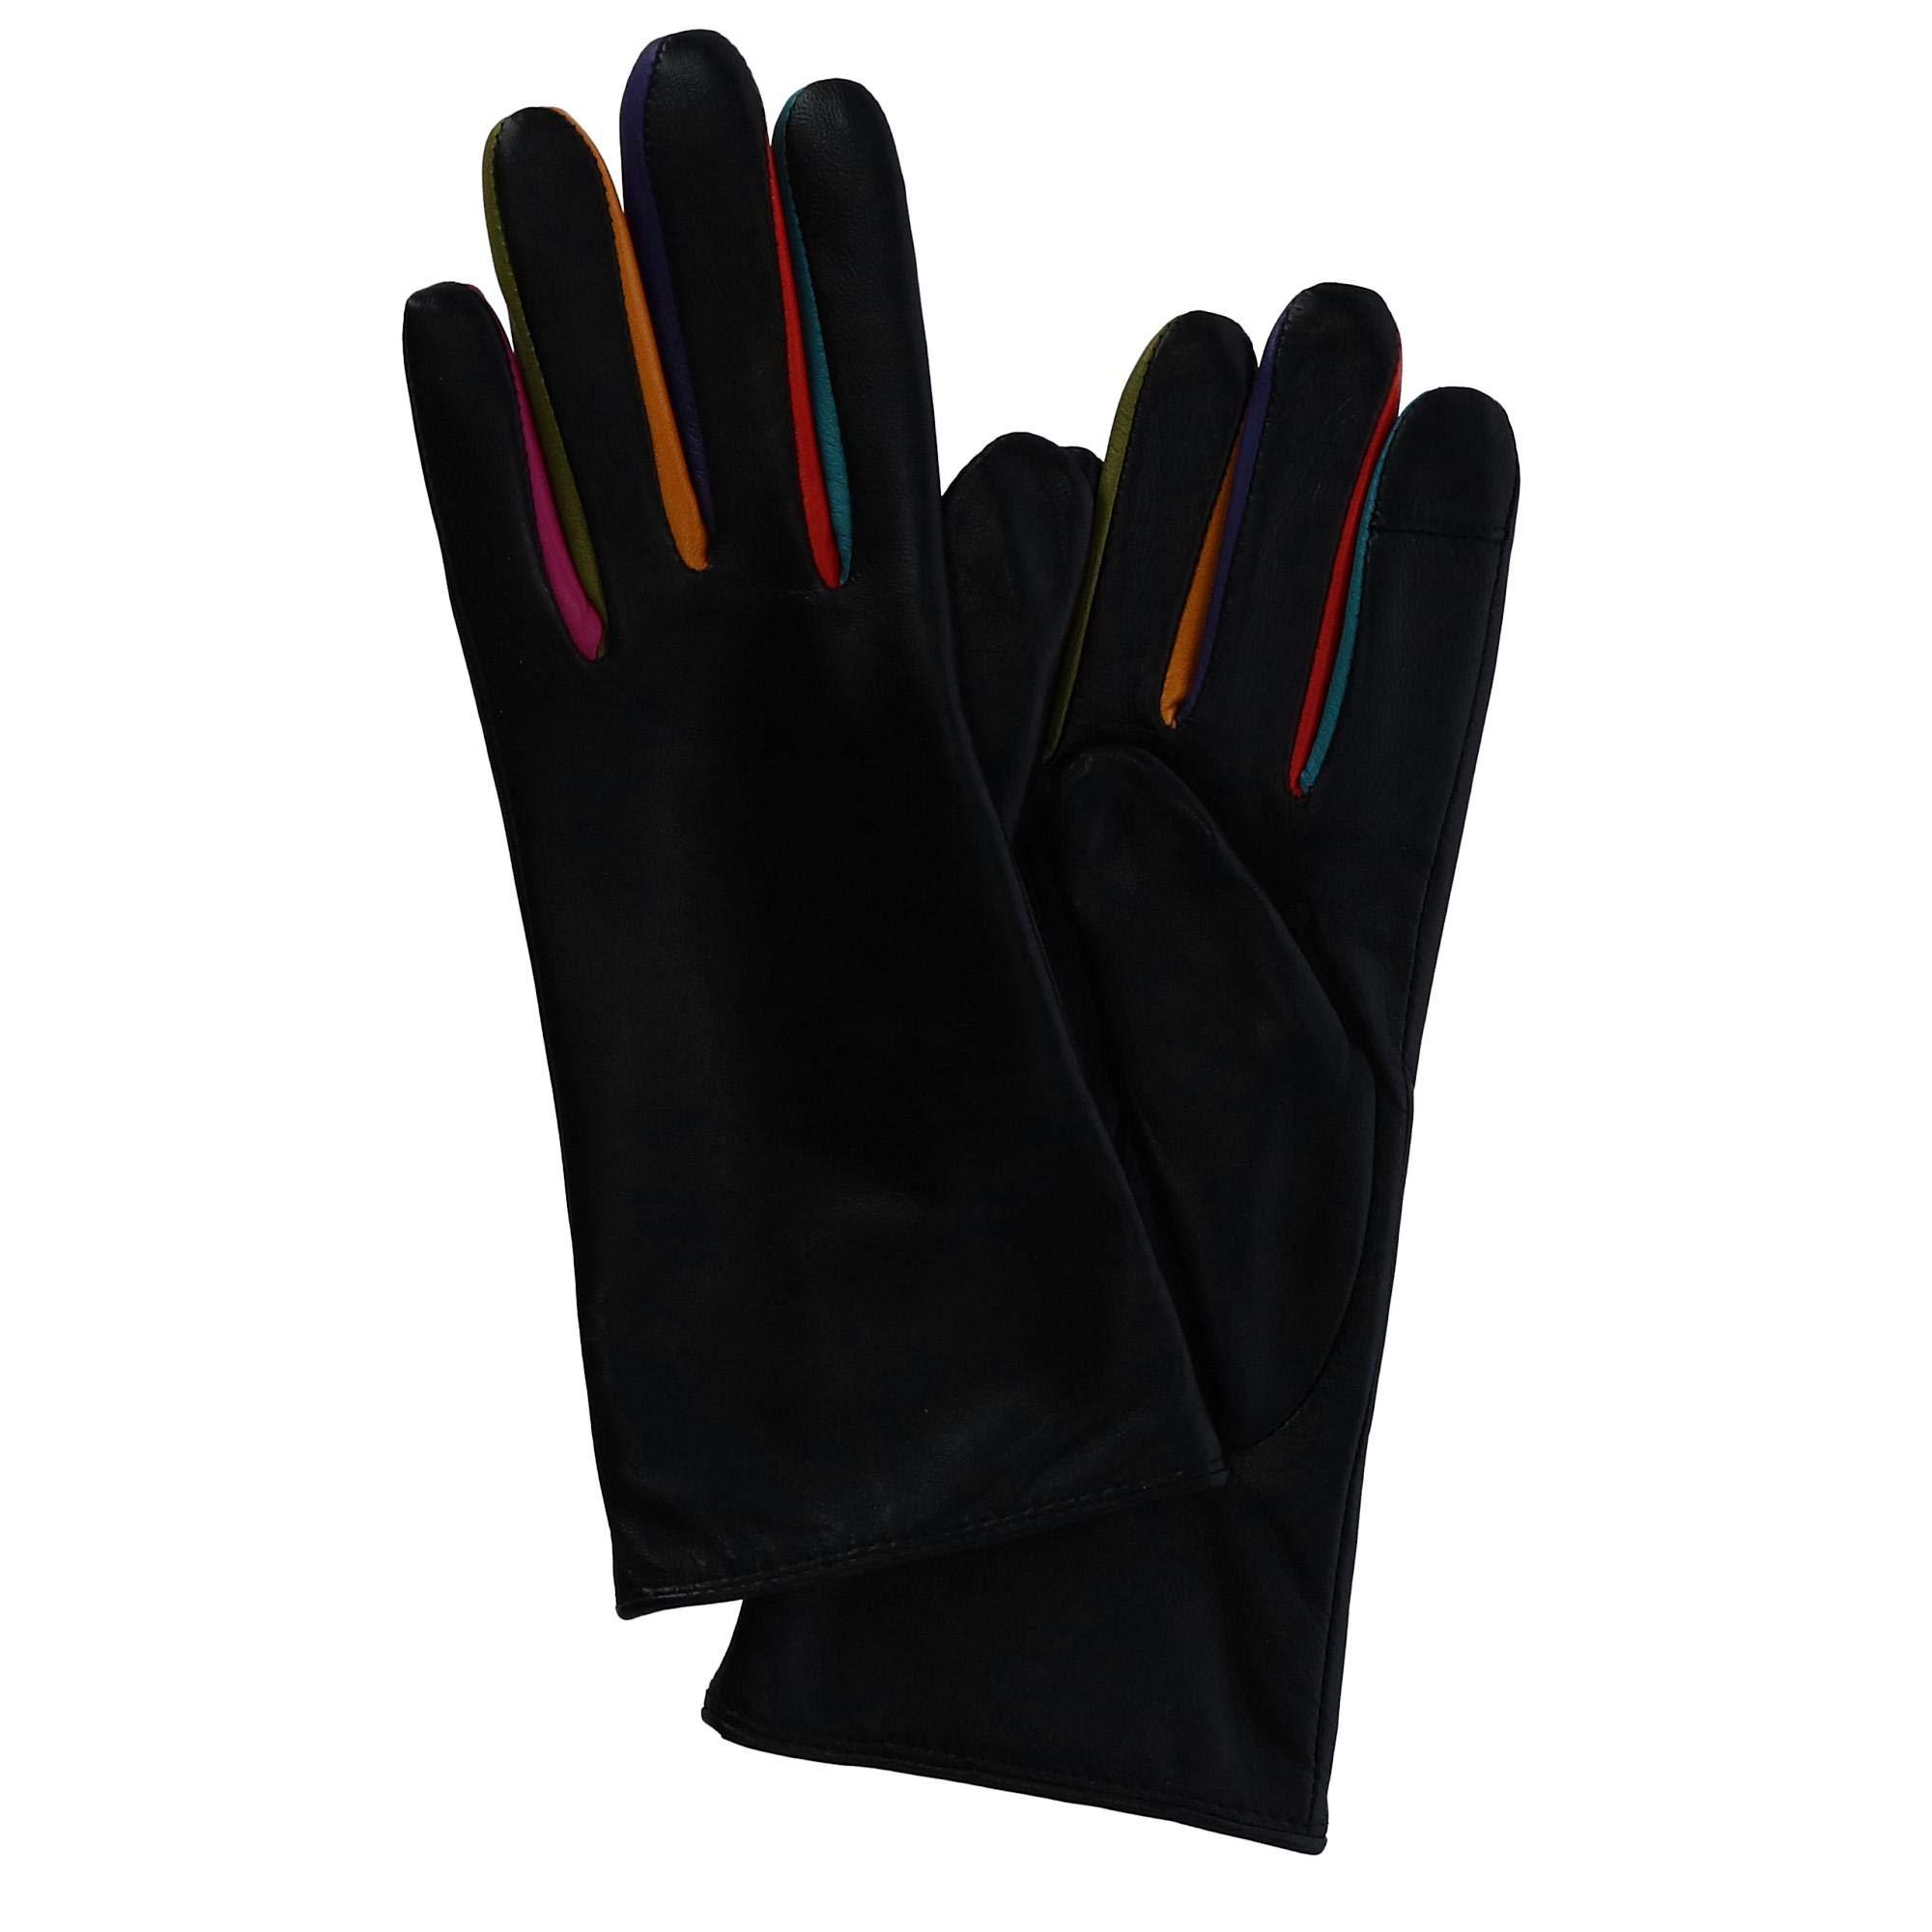 ILI Women's Tech Leather Glove with Multi Color Inlay, Medium, Black